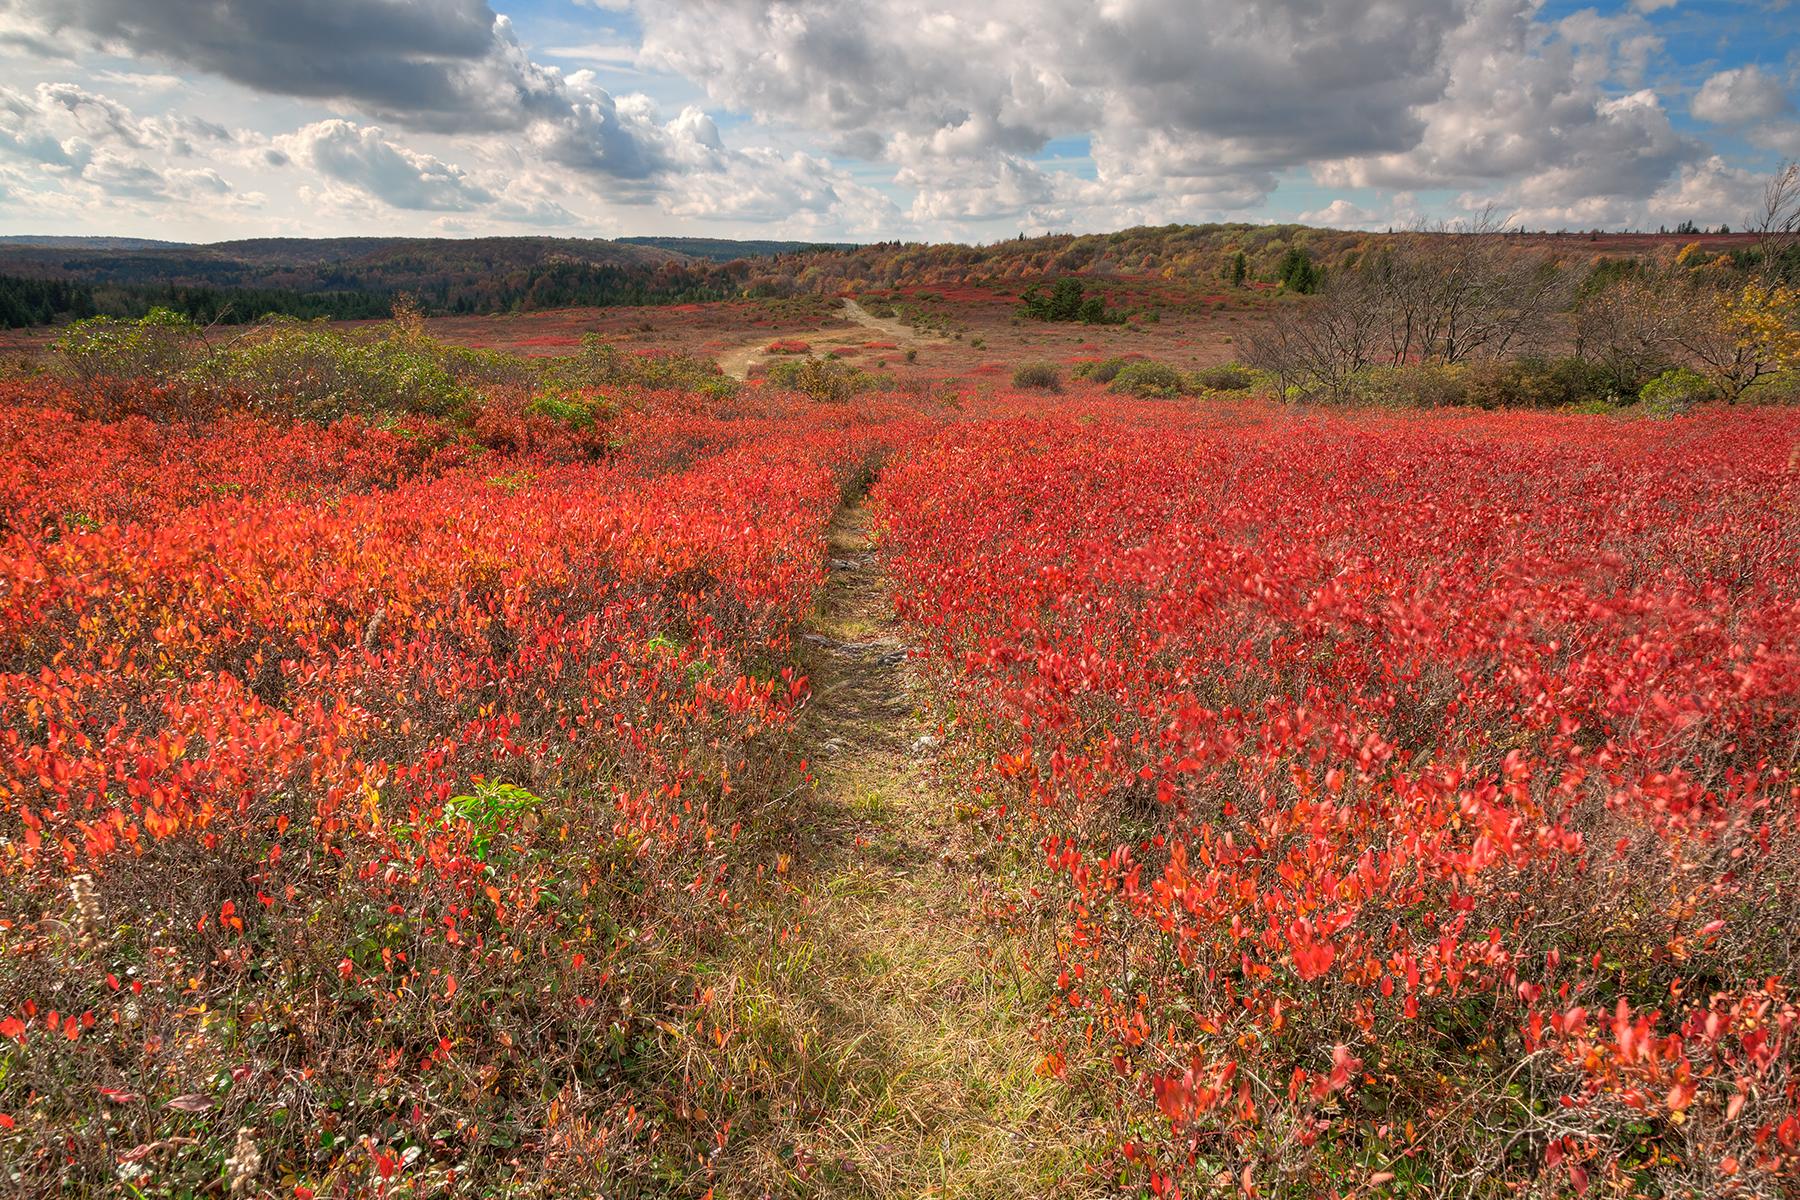 Autumn Huckleberry Trail - HDR, America, Park, Scene, Red, HQ Photo